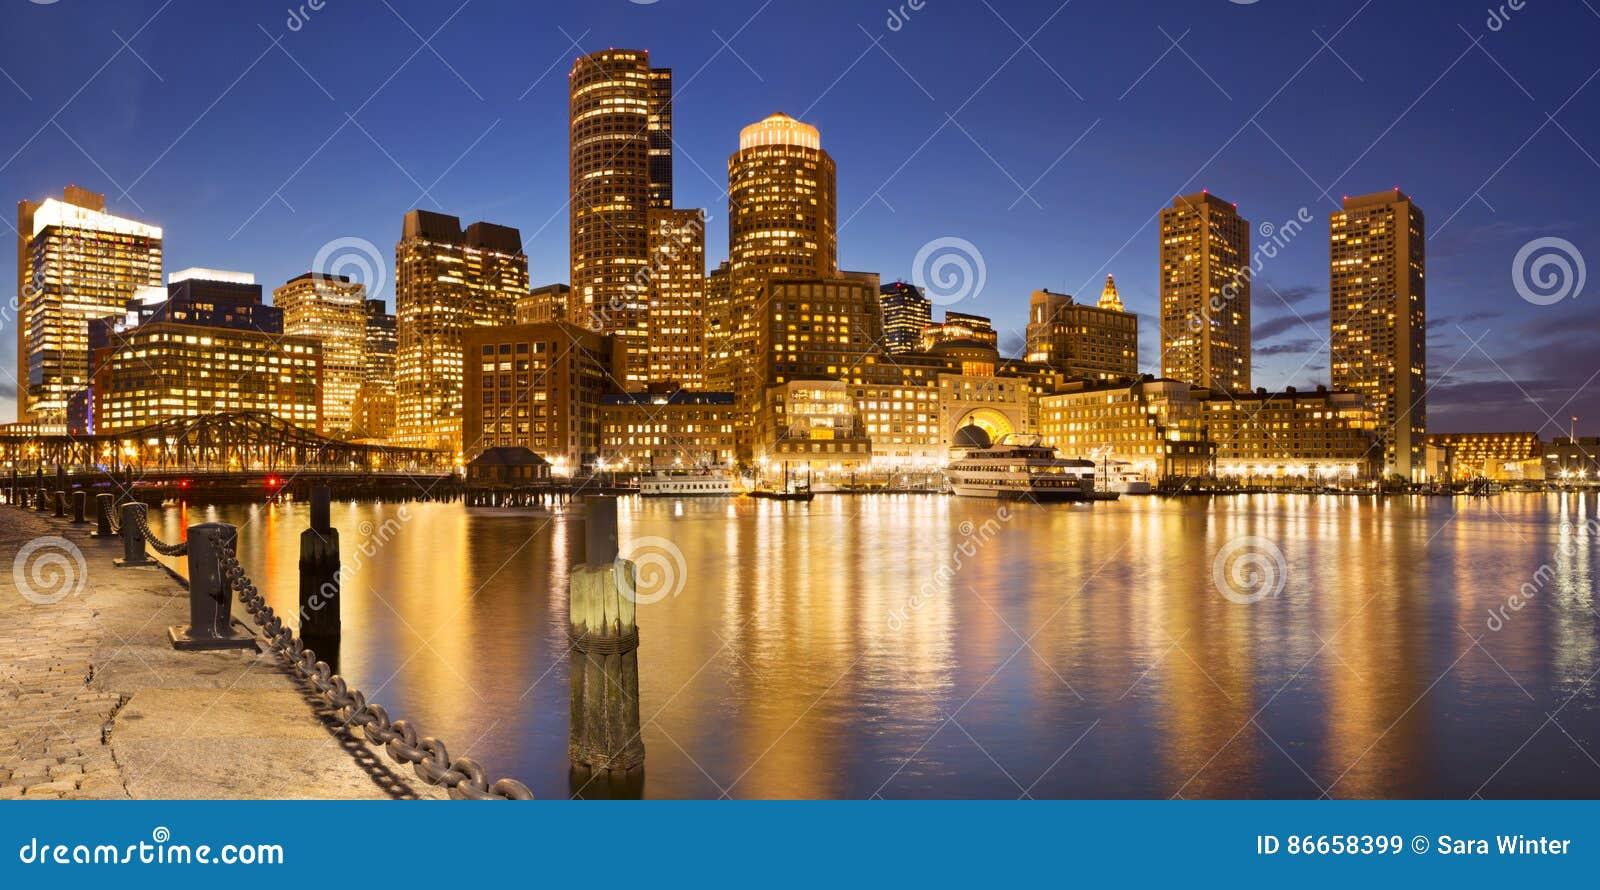 Boston, Massachusetts, USA skyline from Fan Pier at night